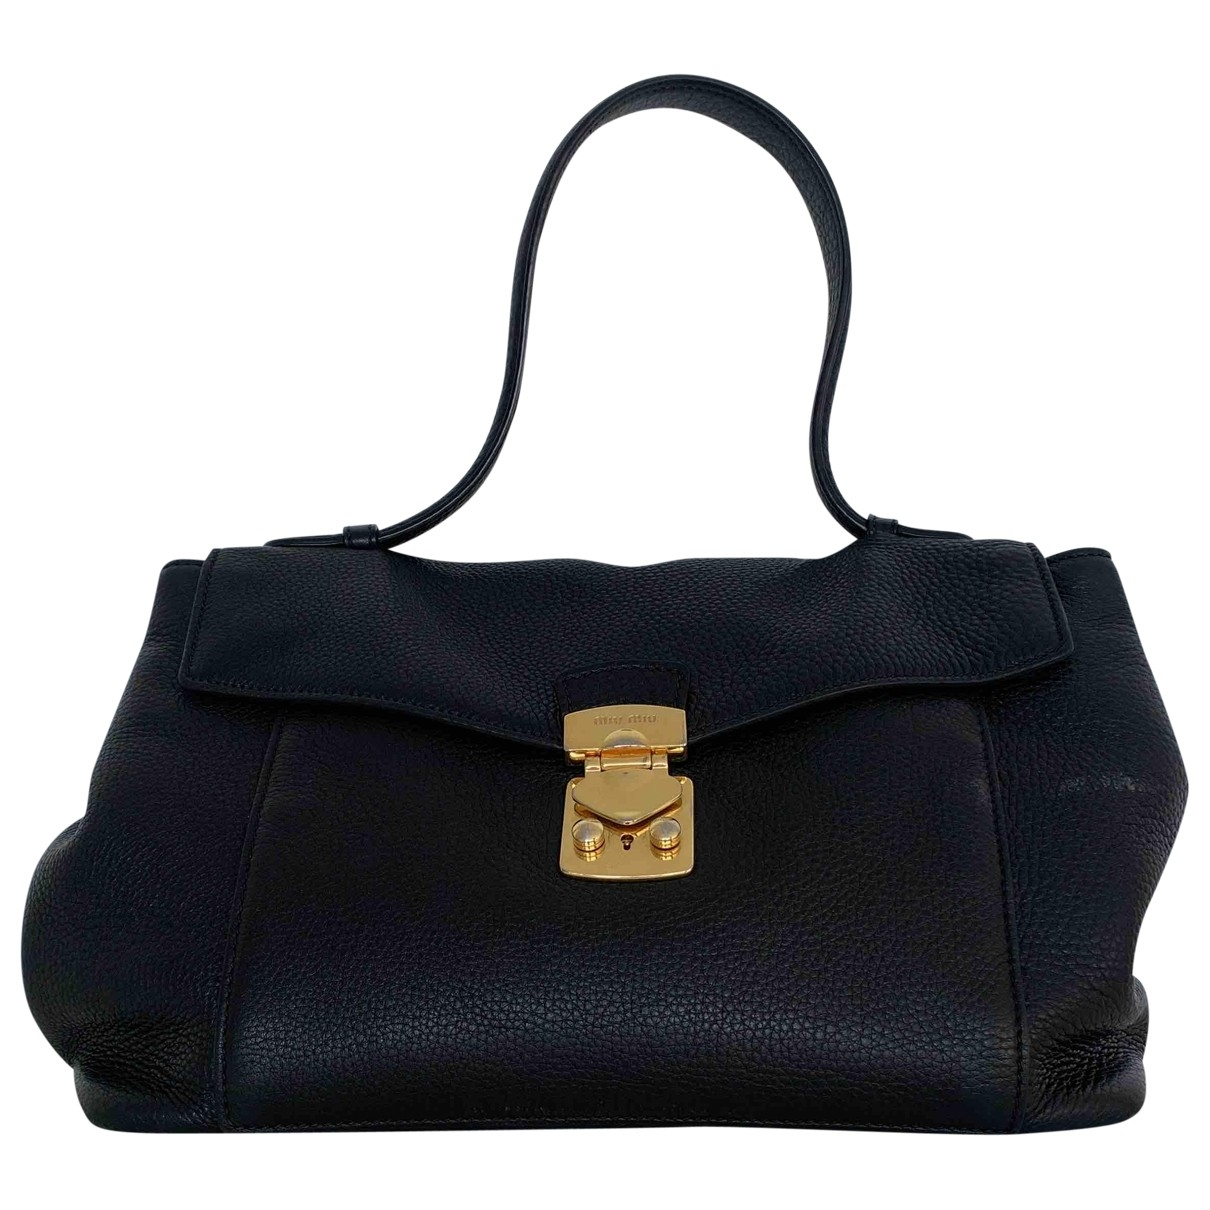 Miu Miu Coffer Black Leather handbag for Women \N